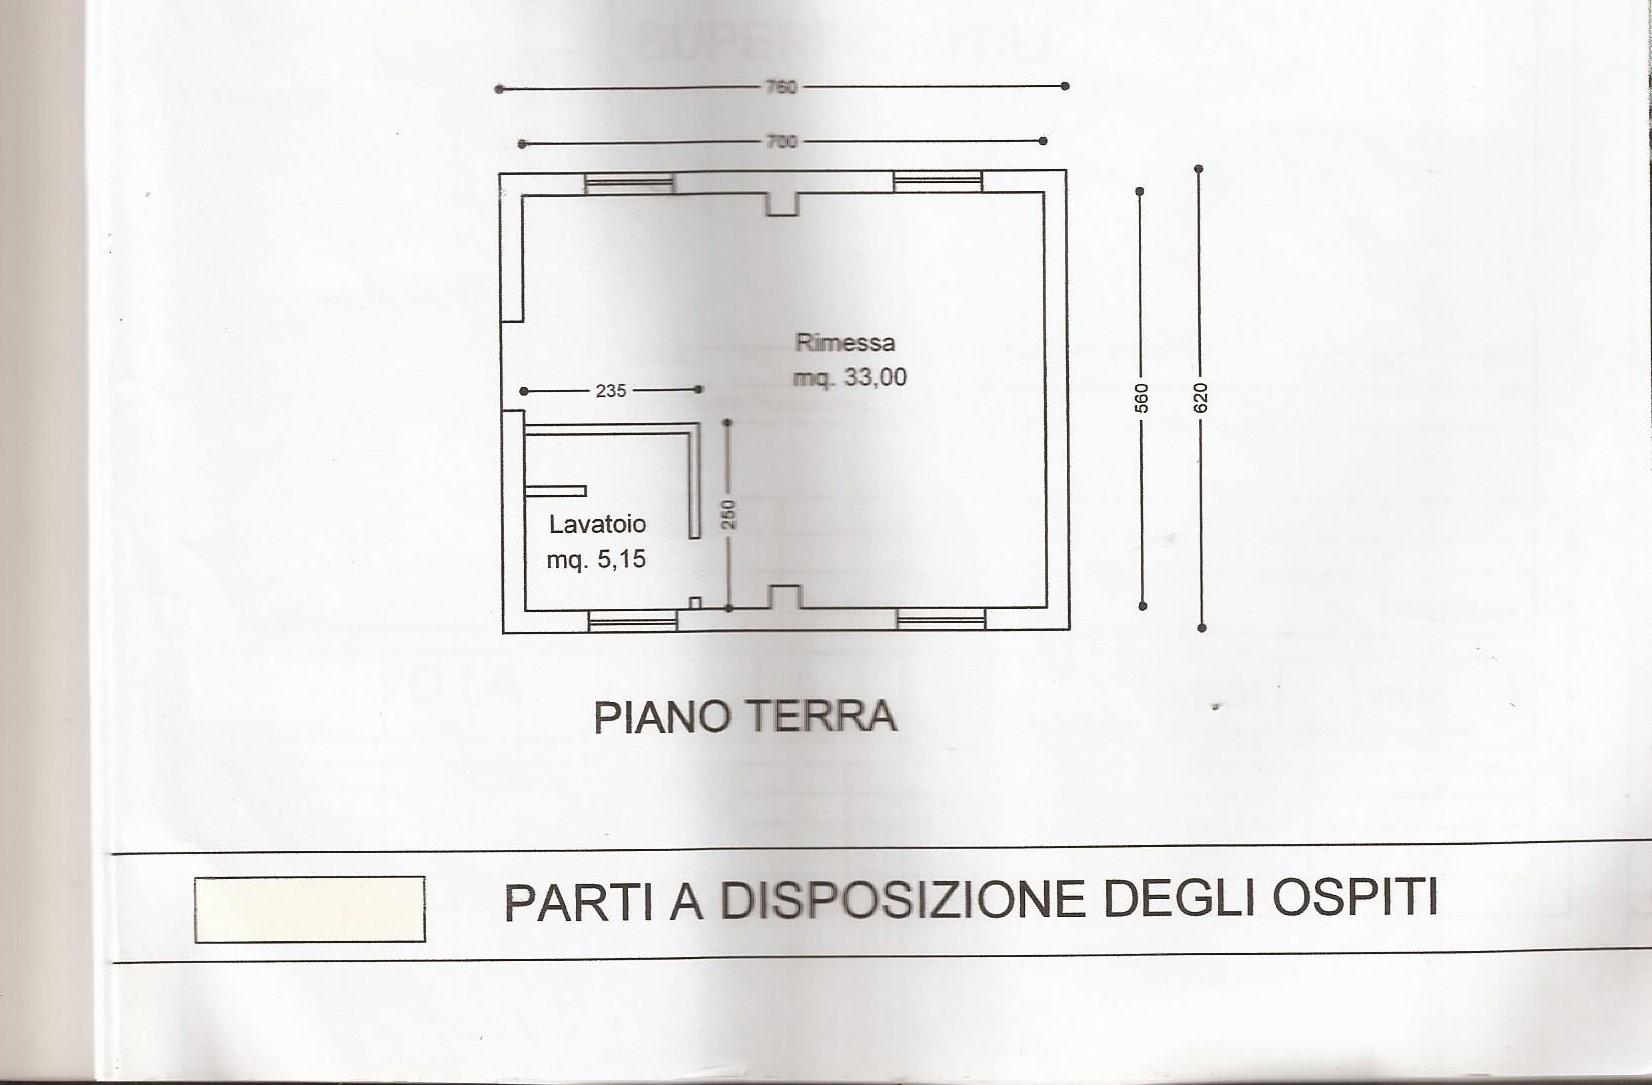 External Guest Suite (La Bella Vista)